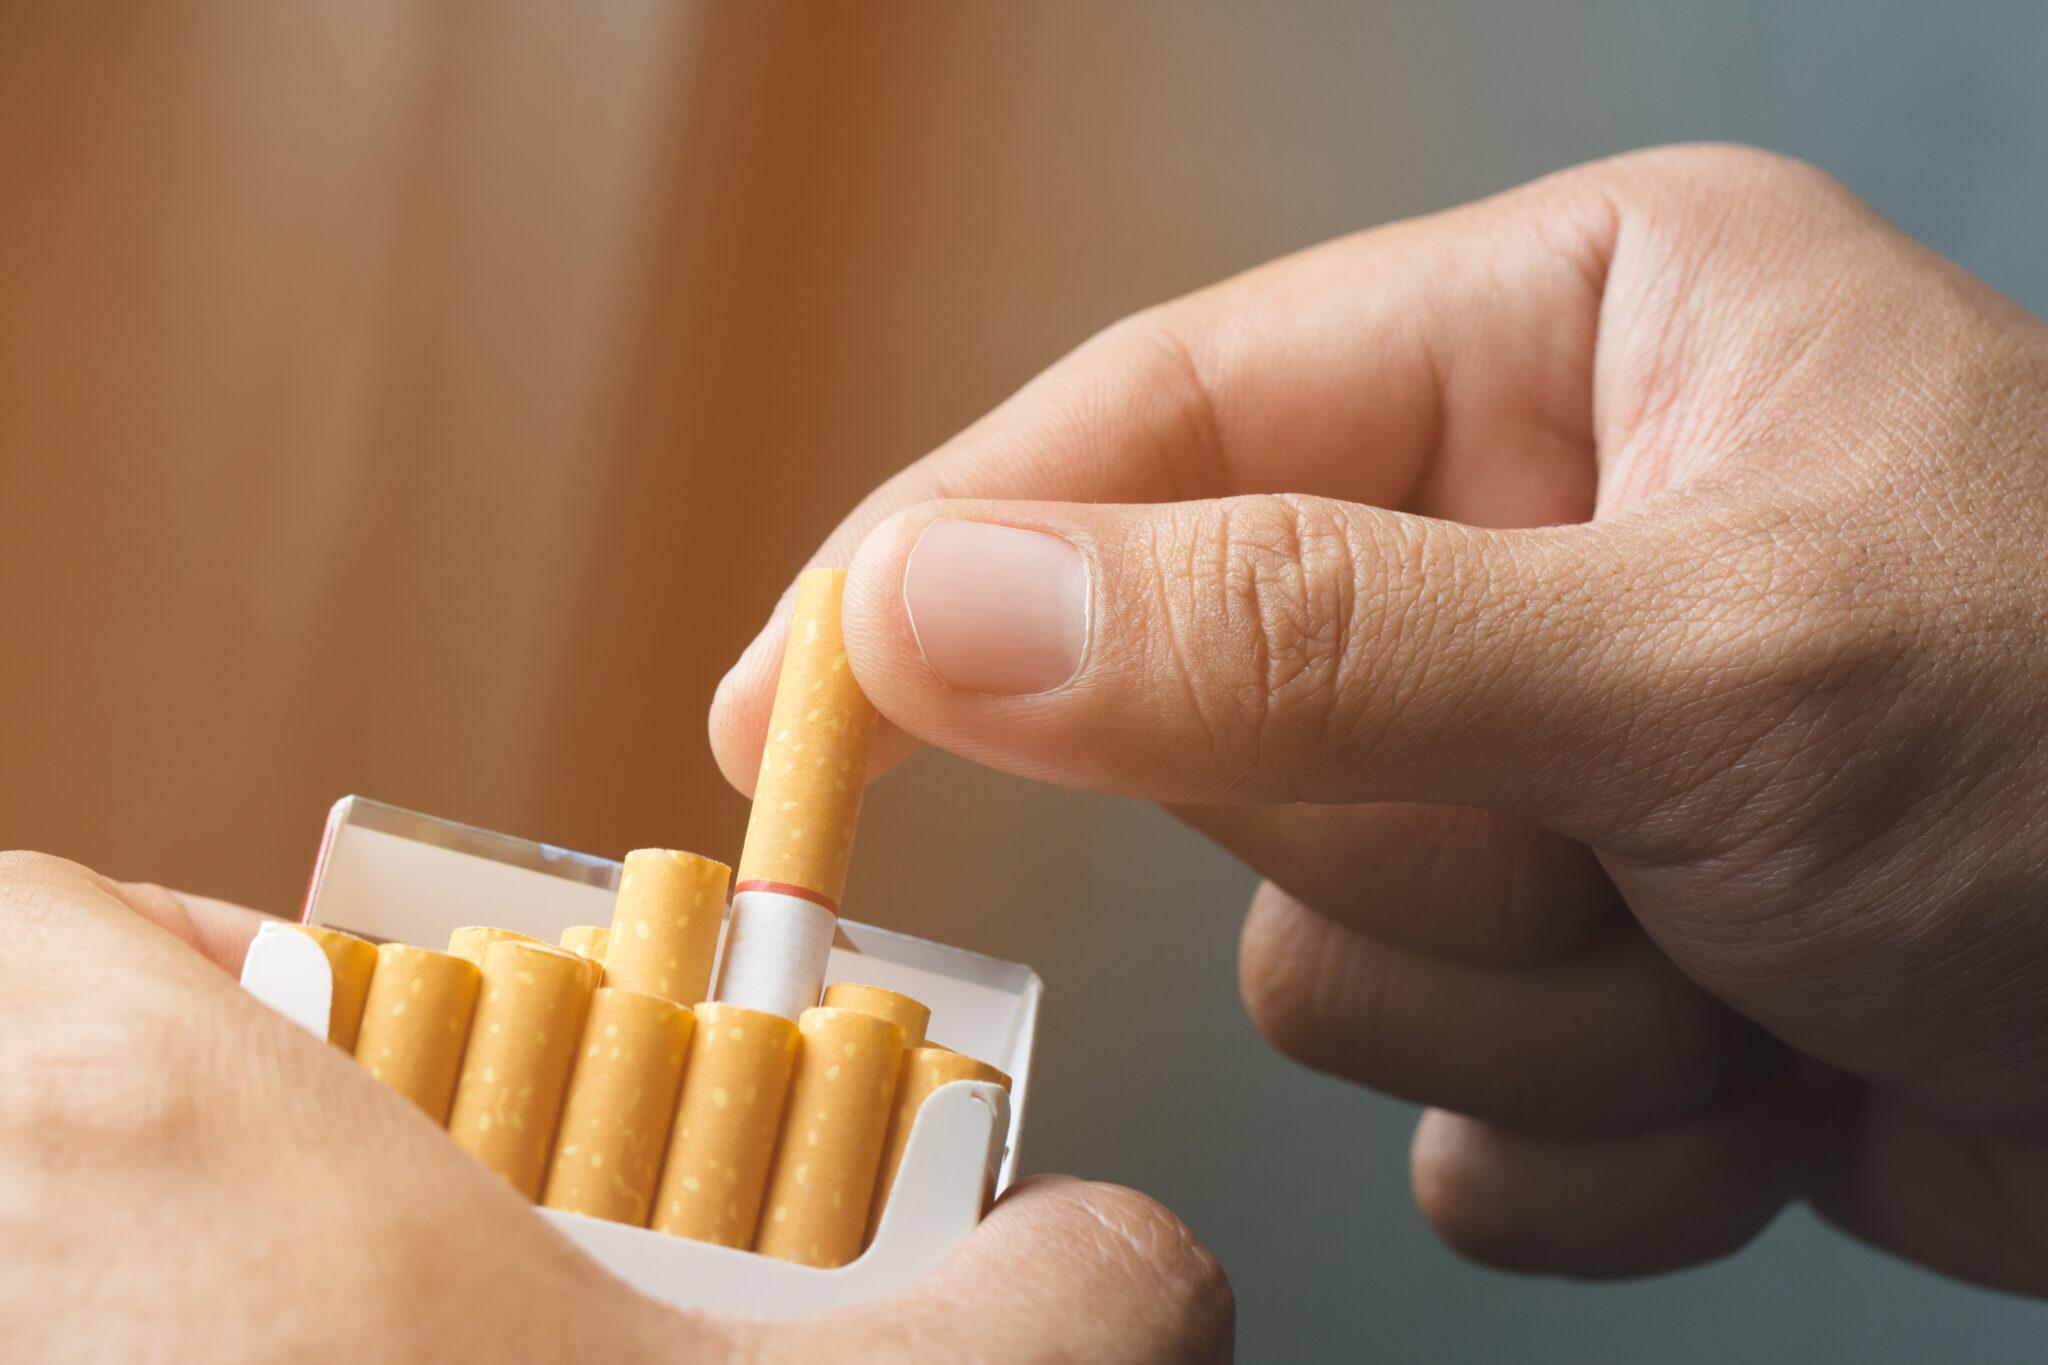 Hand greift zur Zigarettenschachtel